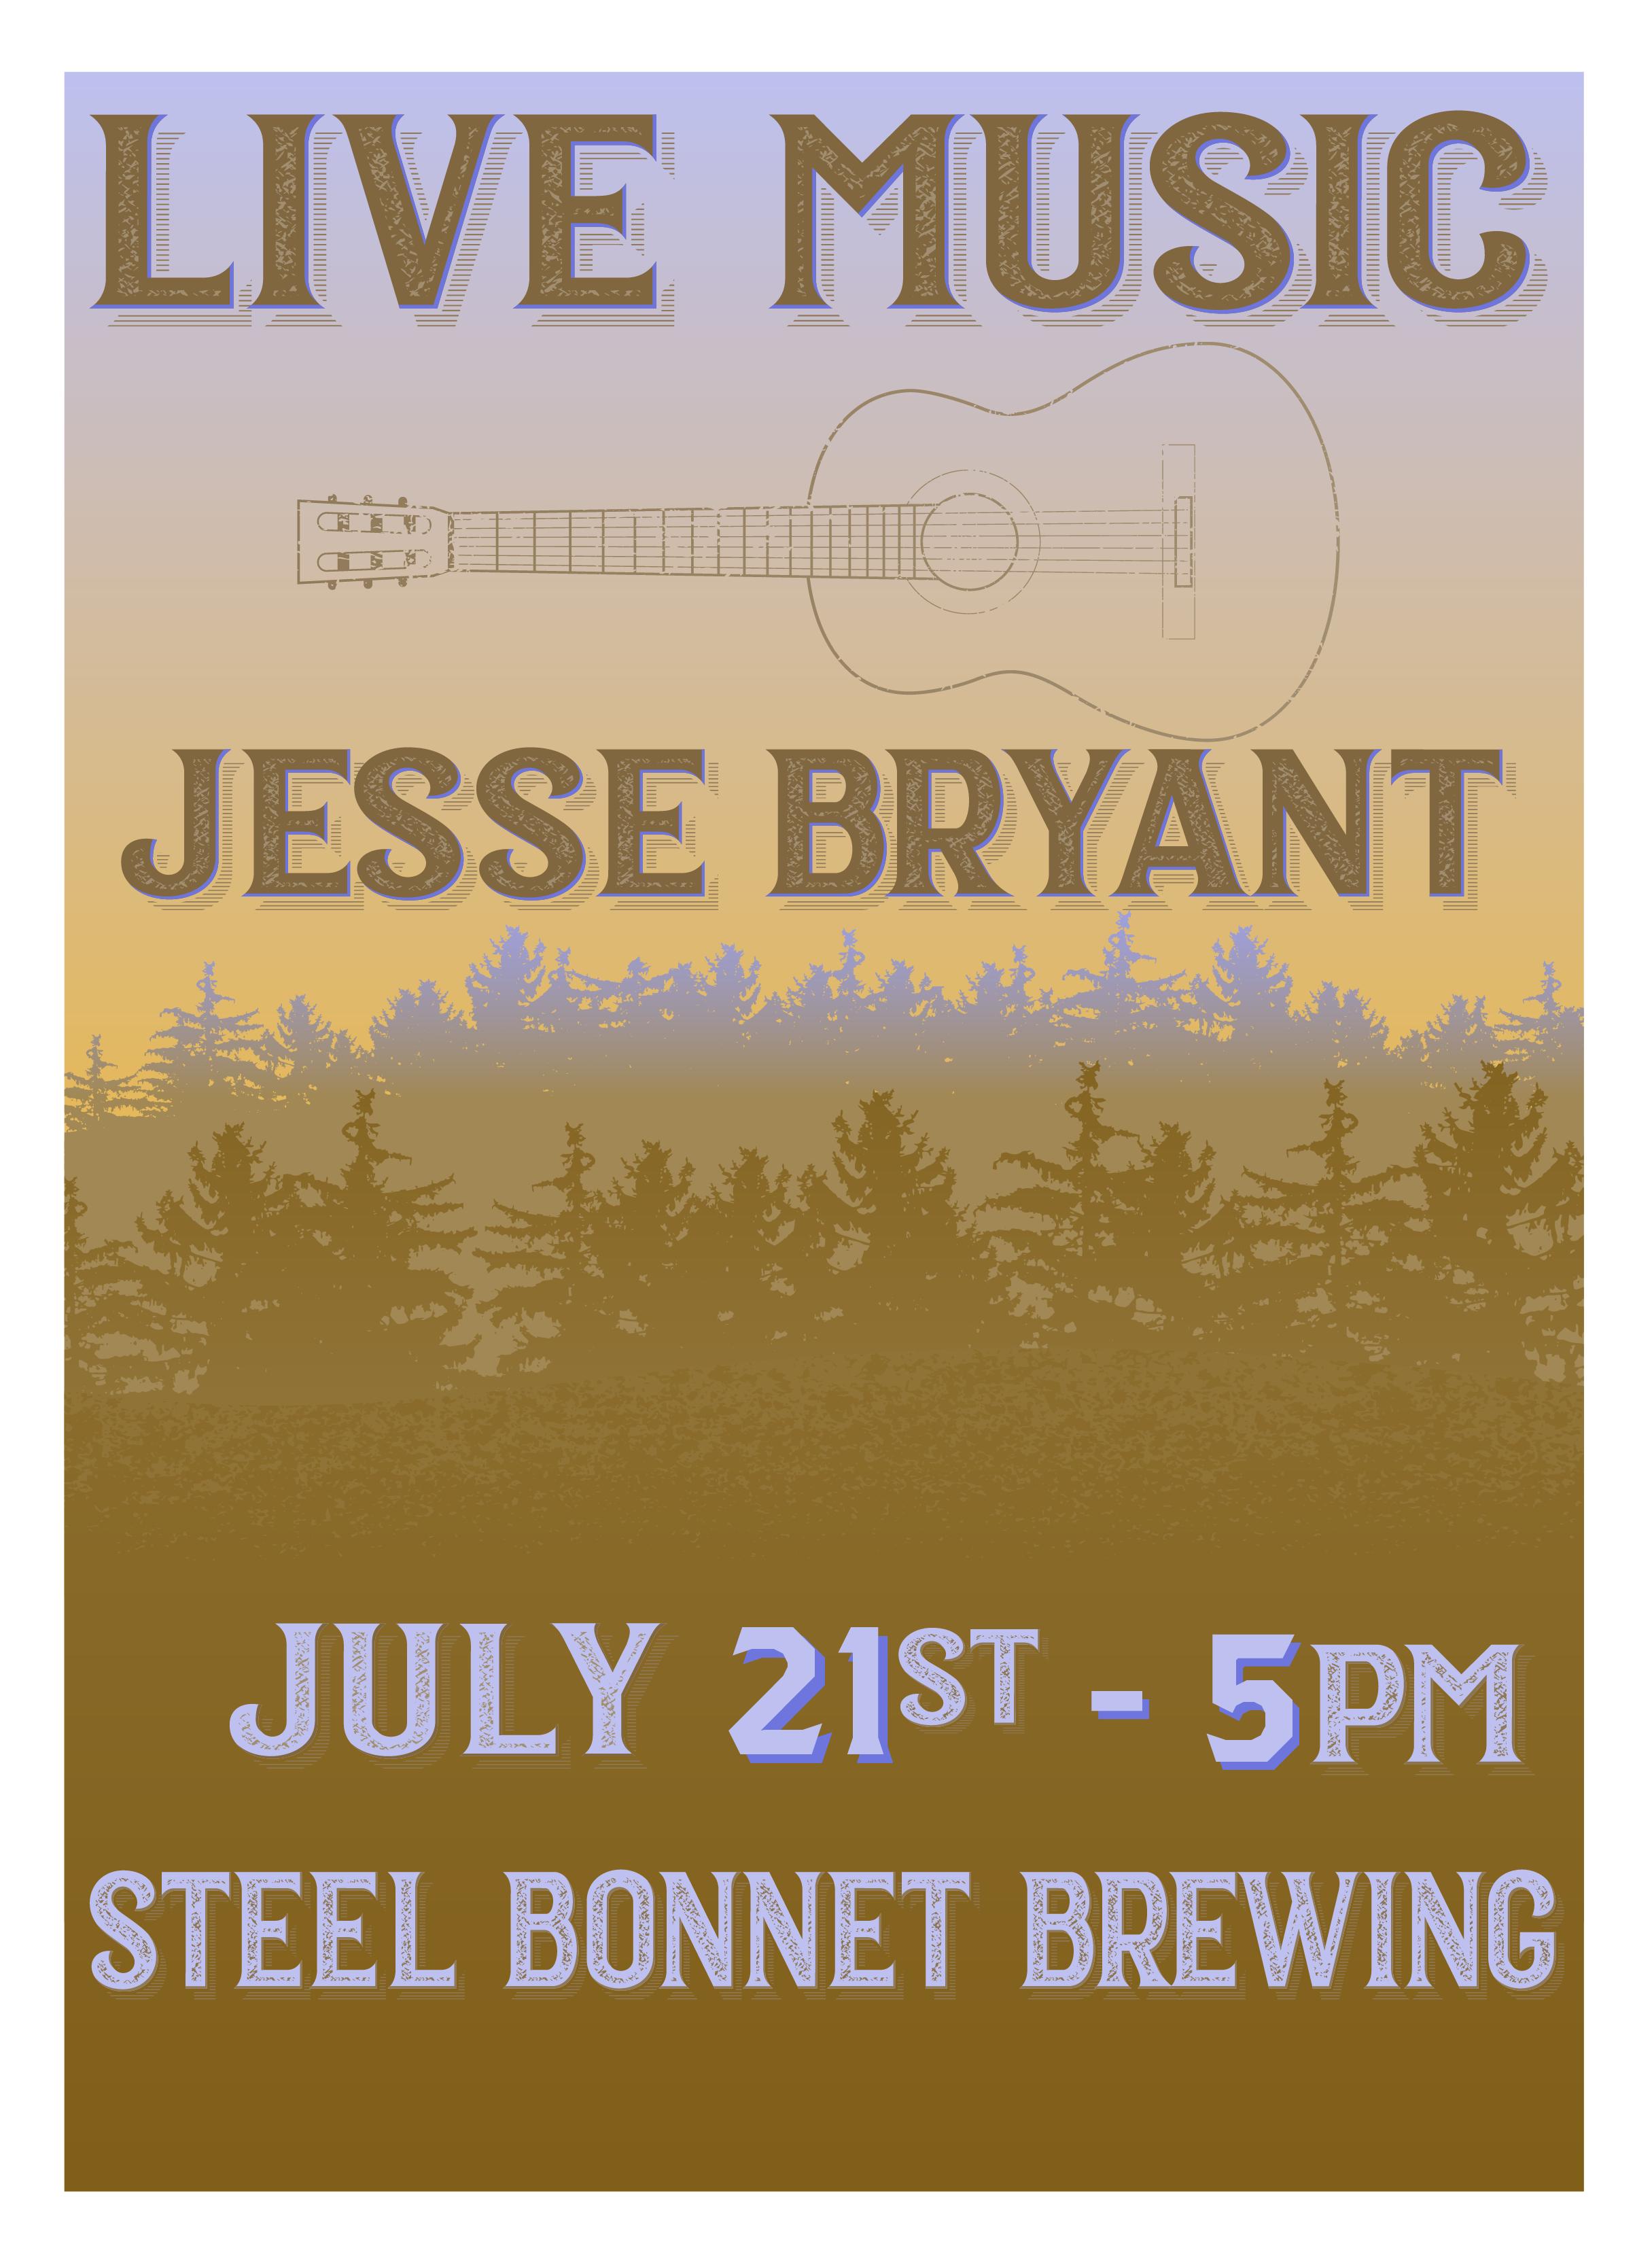 Steel Bonnet - 7.21-01.png